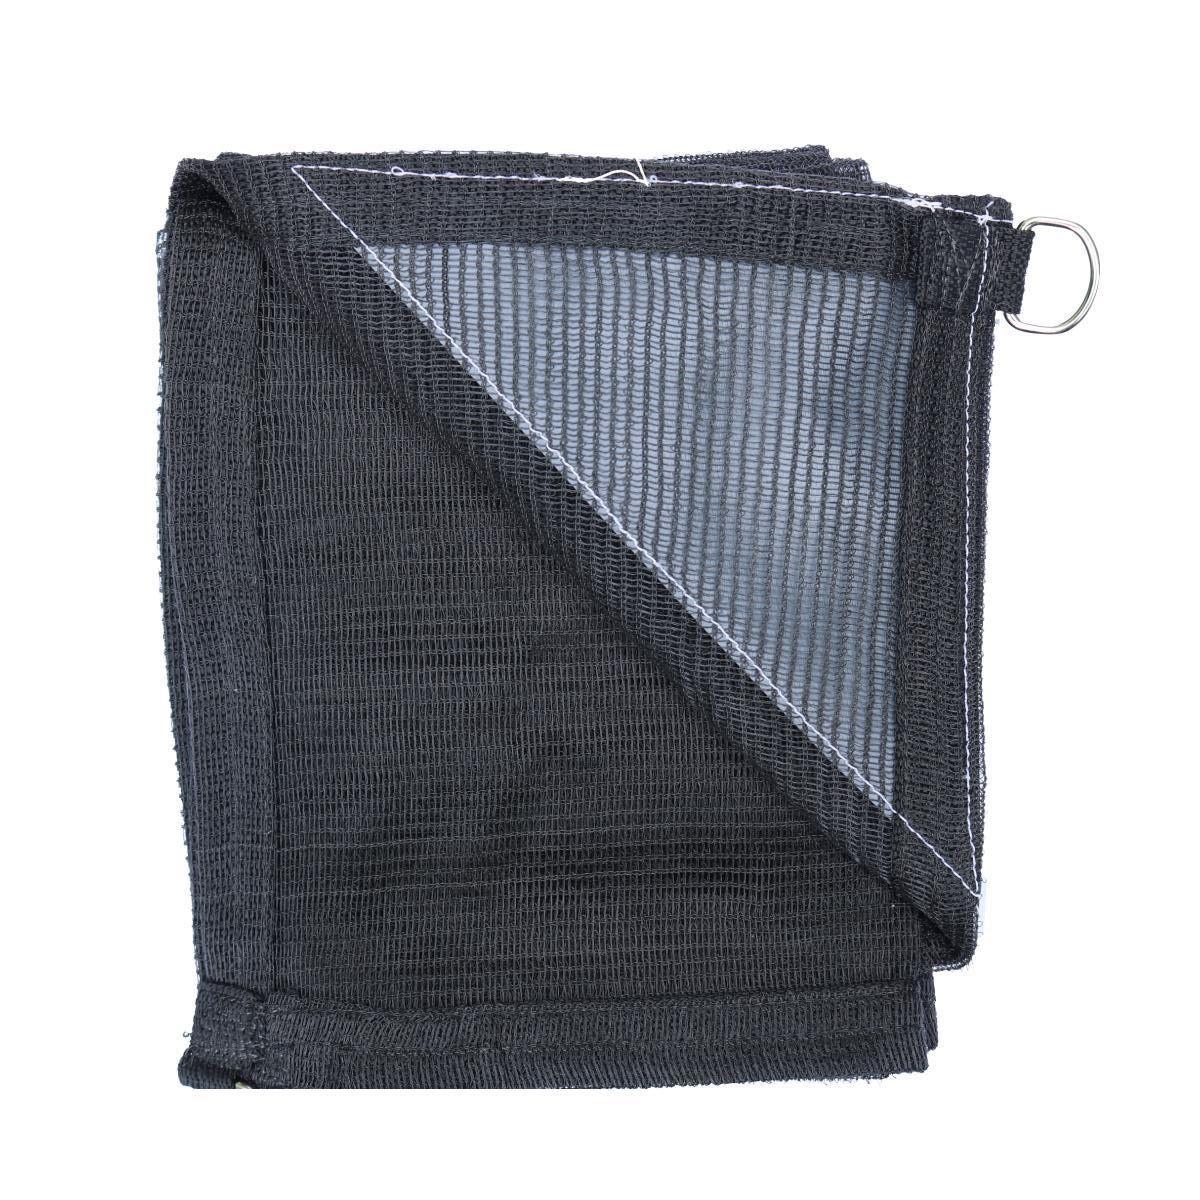 Sombrite 50 Multi Proteção 3m x 1,5m